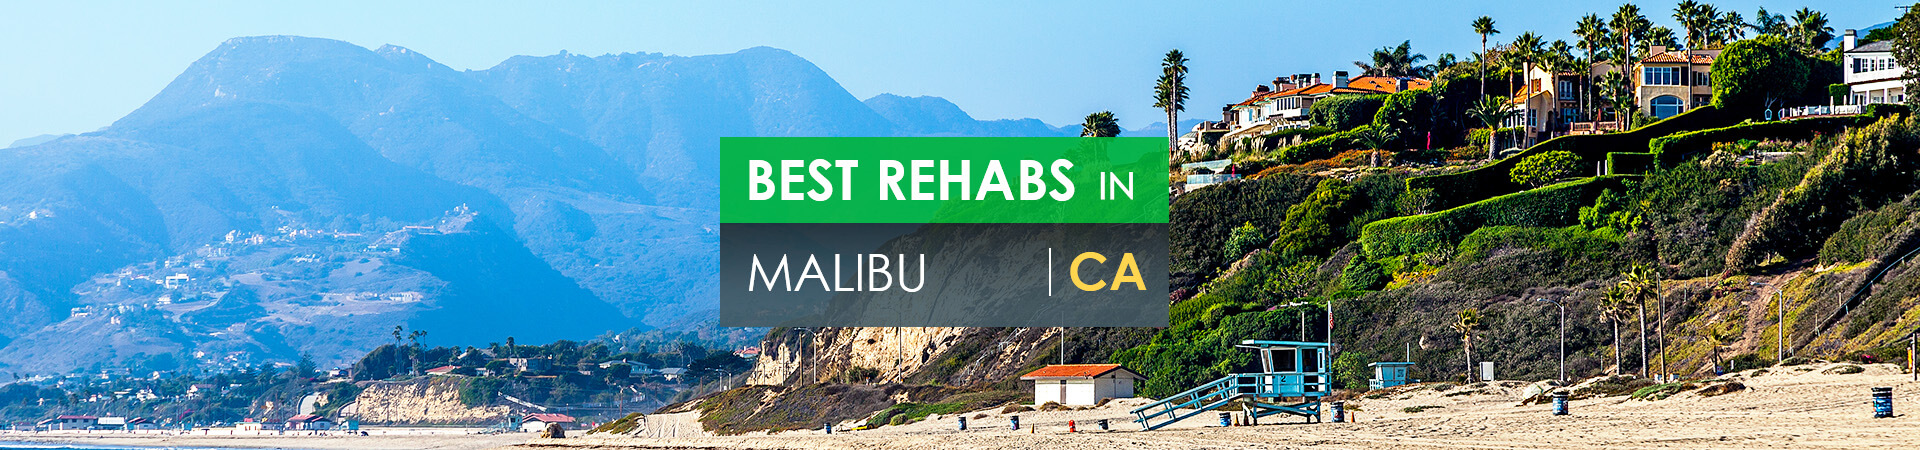 Best rehabs in Malibu, CA